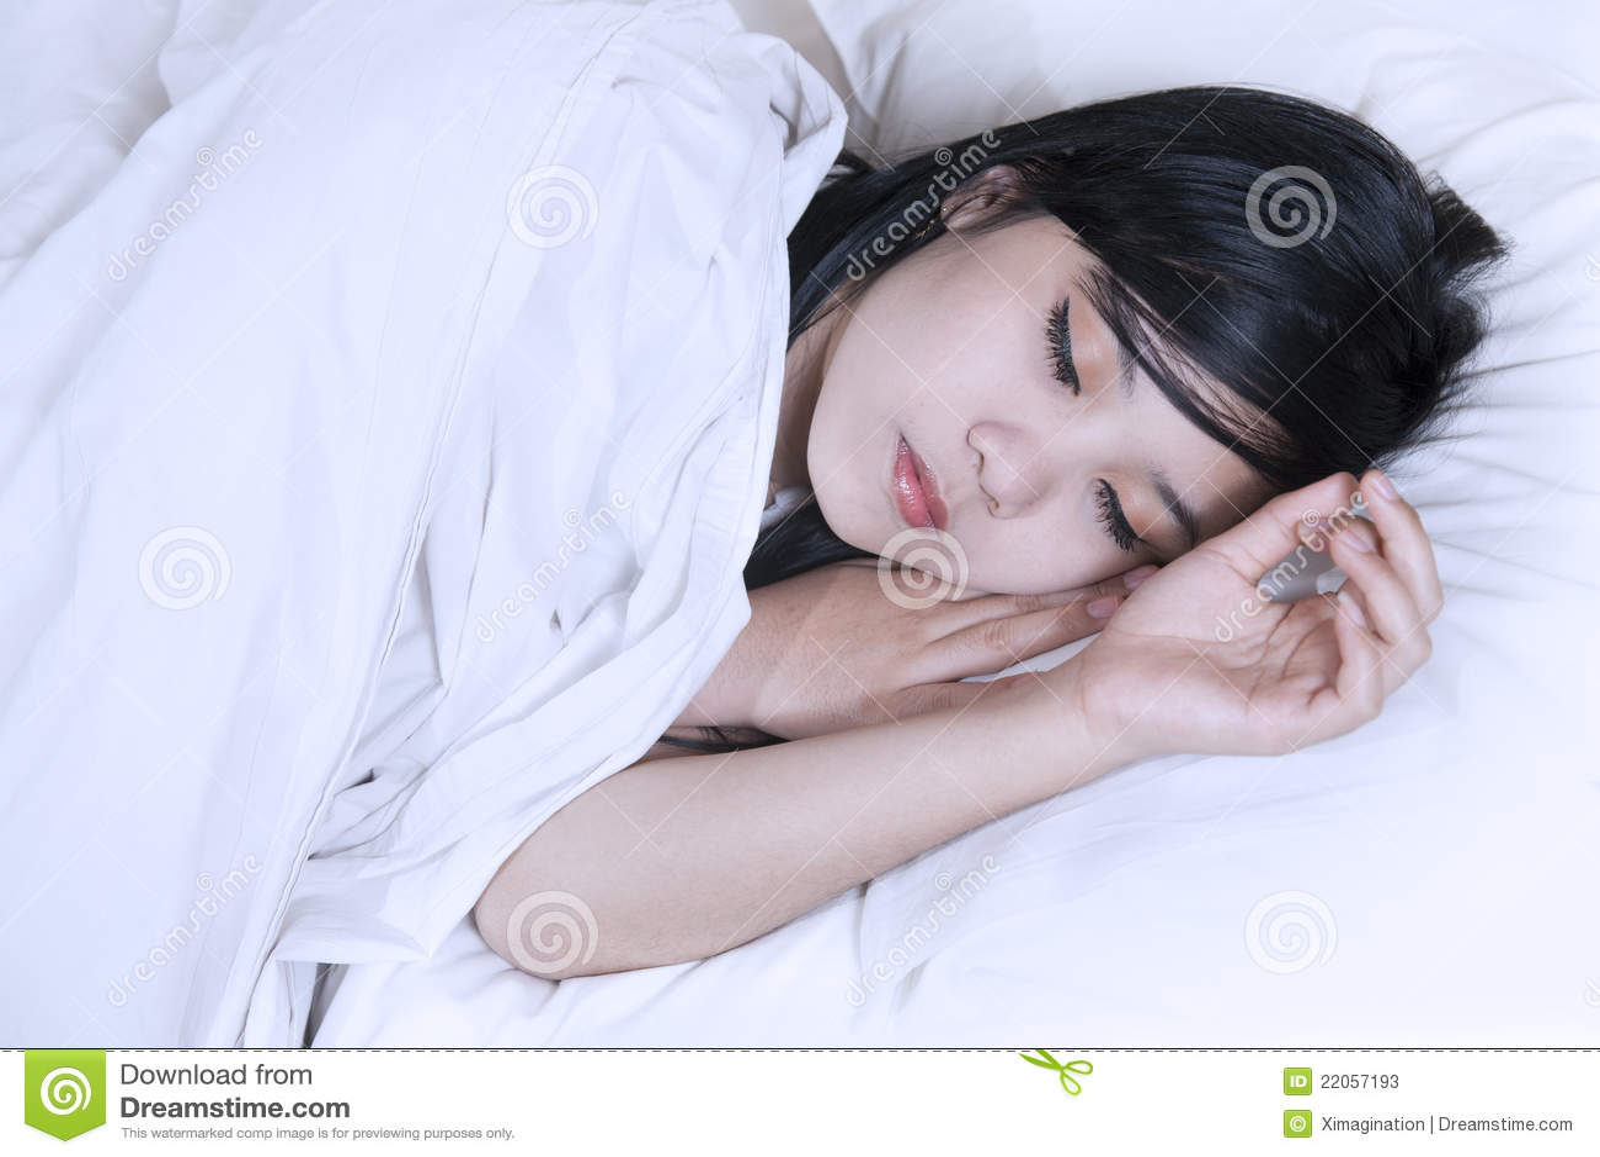 pamela anderson pose porn pic